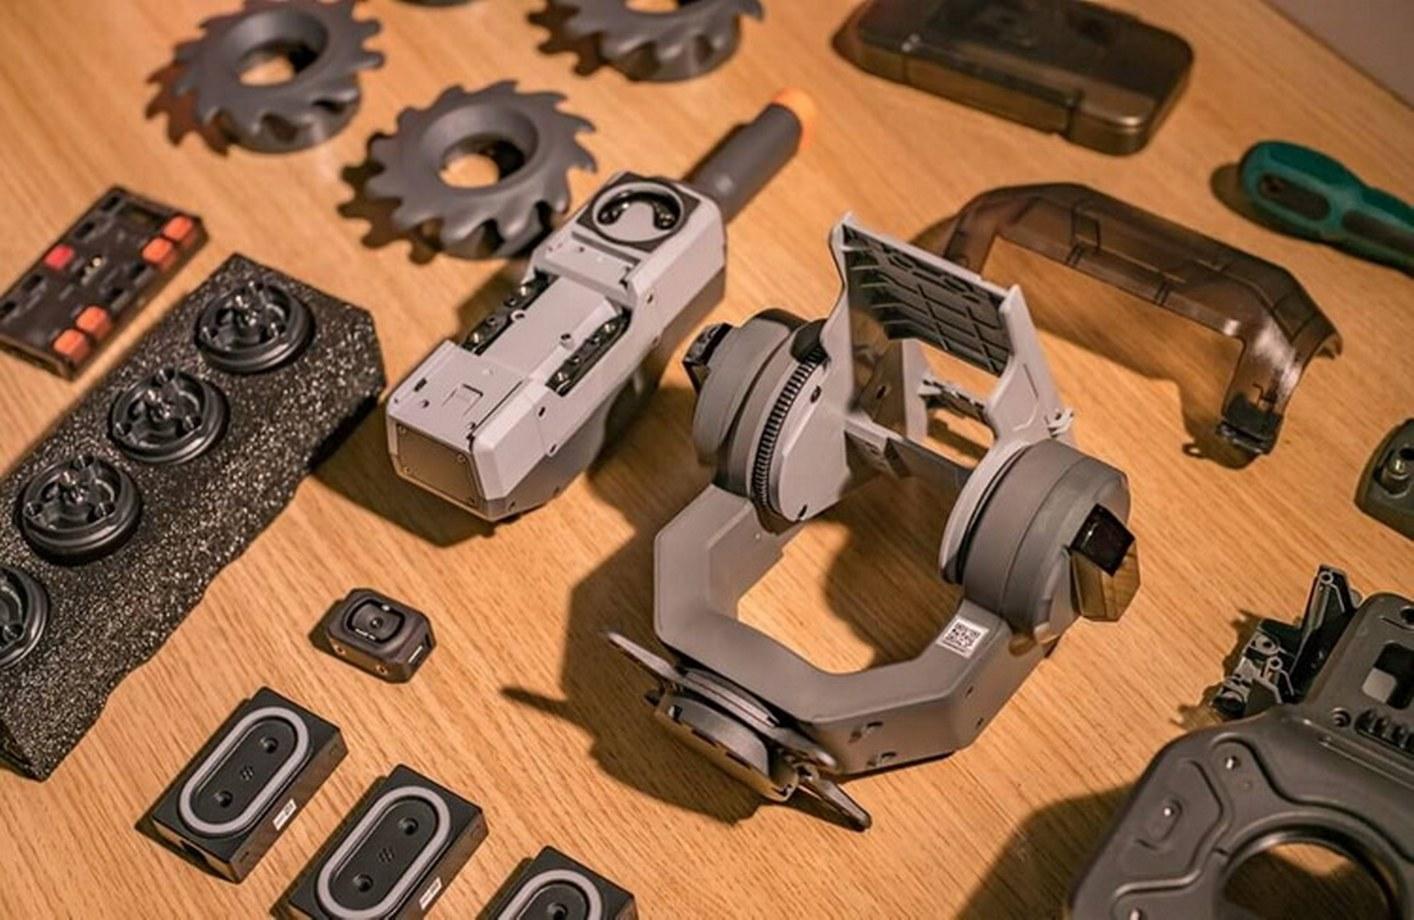 Robomaster S1-Gimbal Module and Blaster